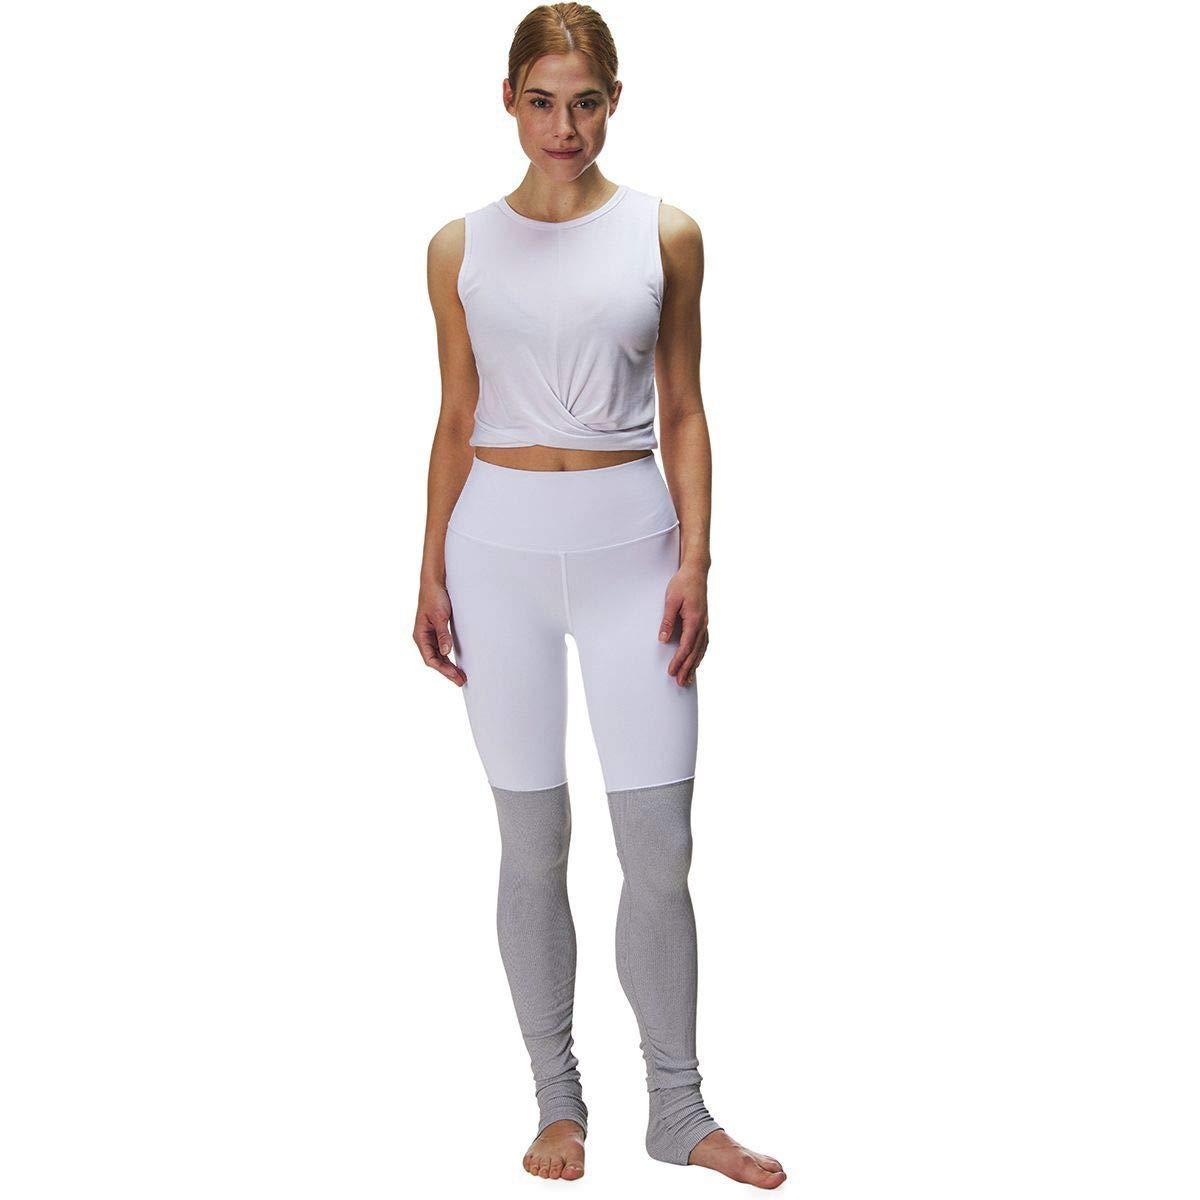 Alo Yoga High-Waist Goddess Legging - Women's White/Dove Grey Heather, XS by Alo Yoga (Image #3)